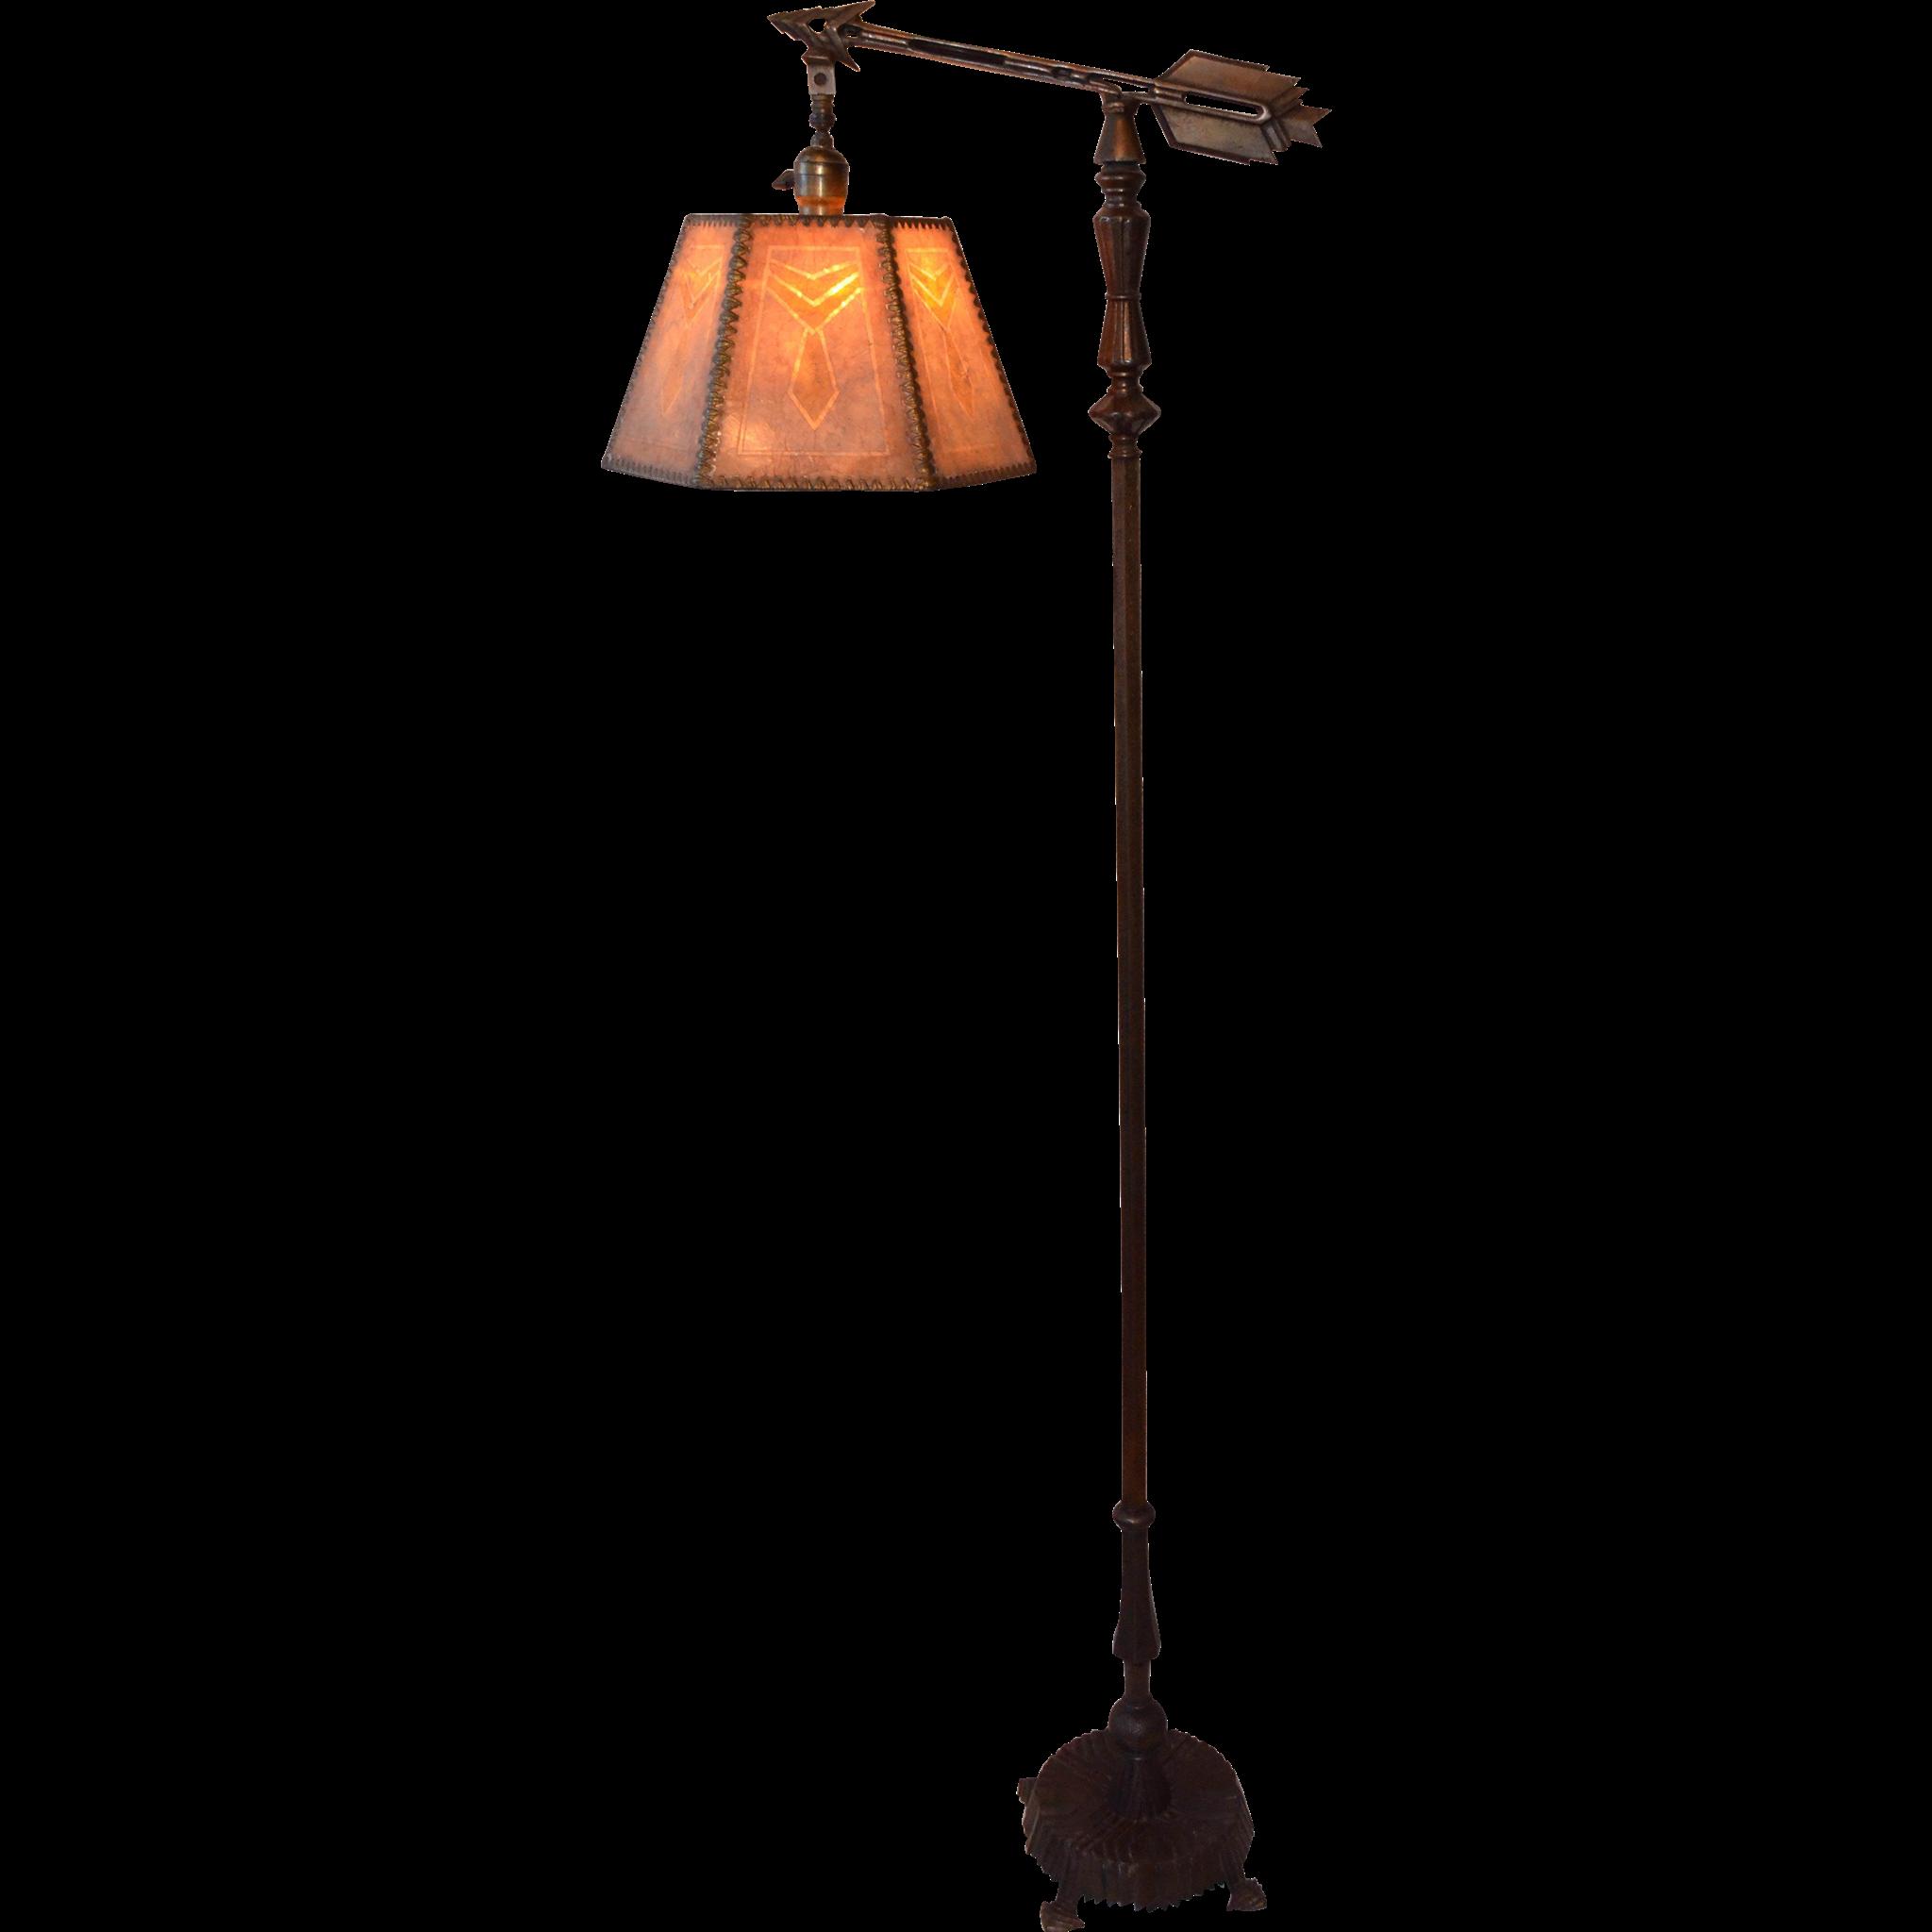 Art Deco Bridge Lamp With Original Mica Shade From